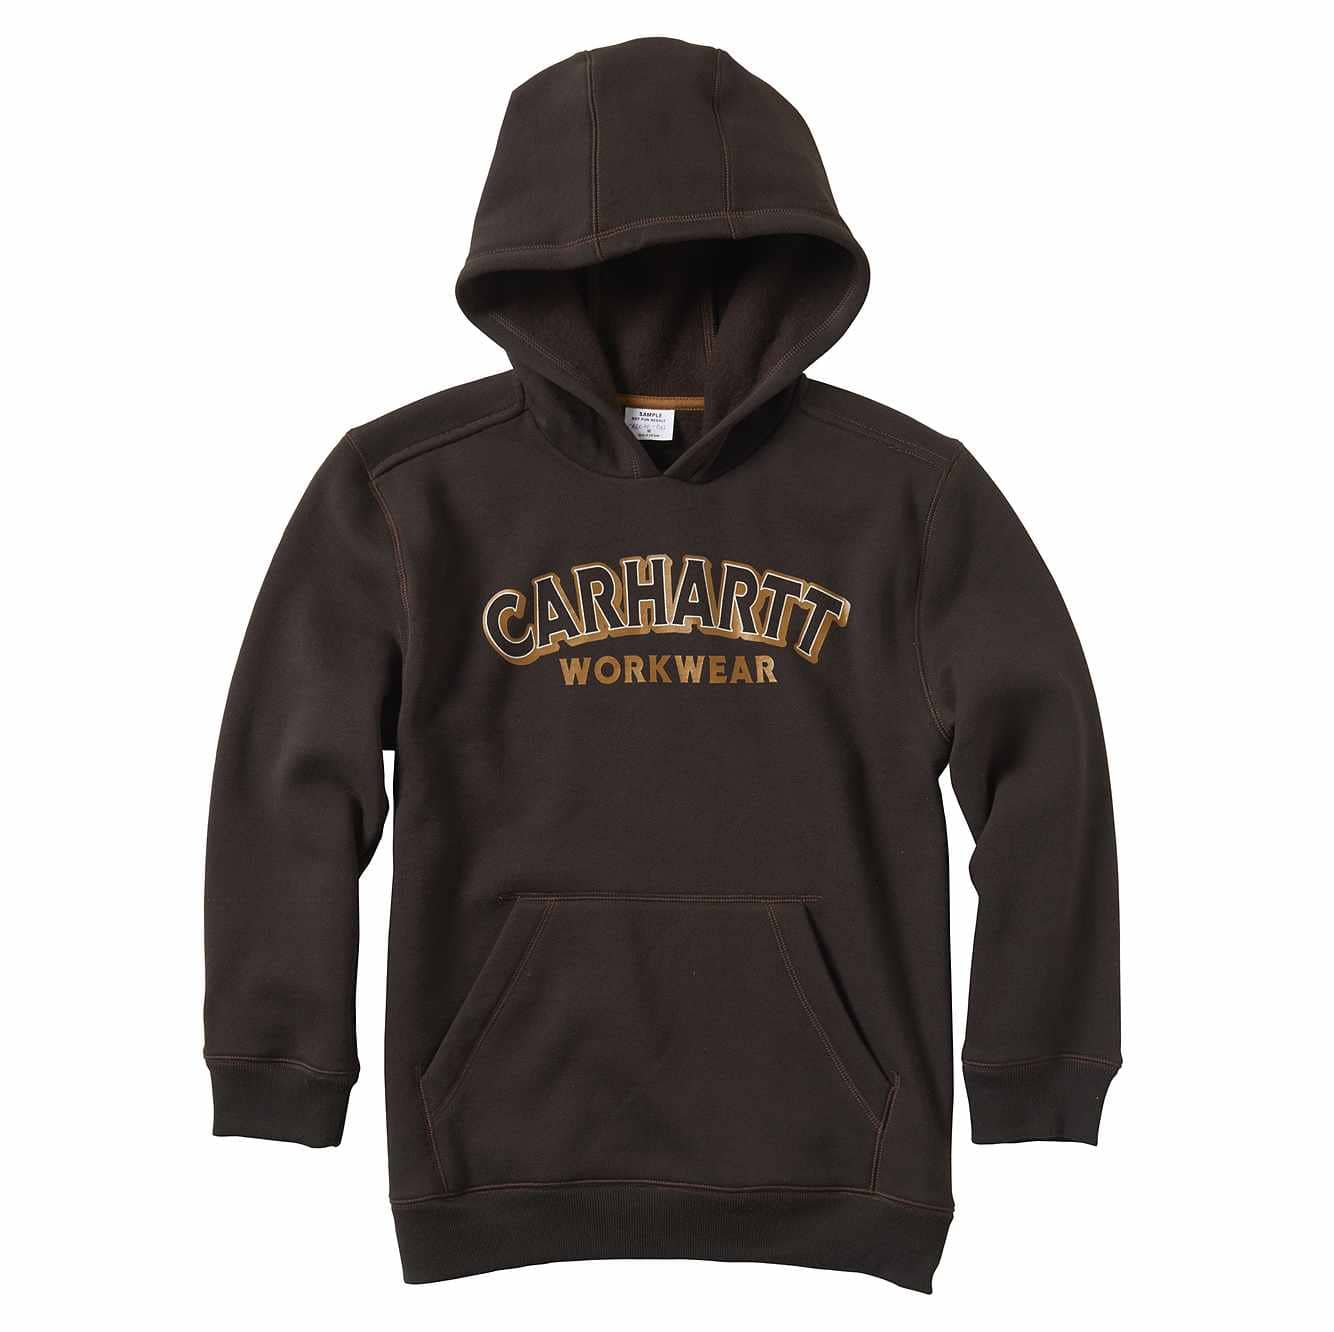 Picture of Carhartt Workwear Sweatshirt in Mustang Brown